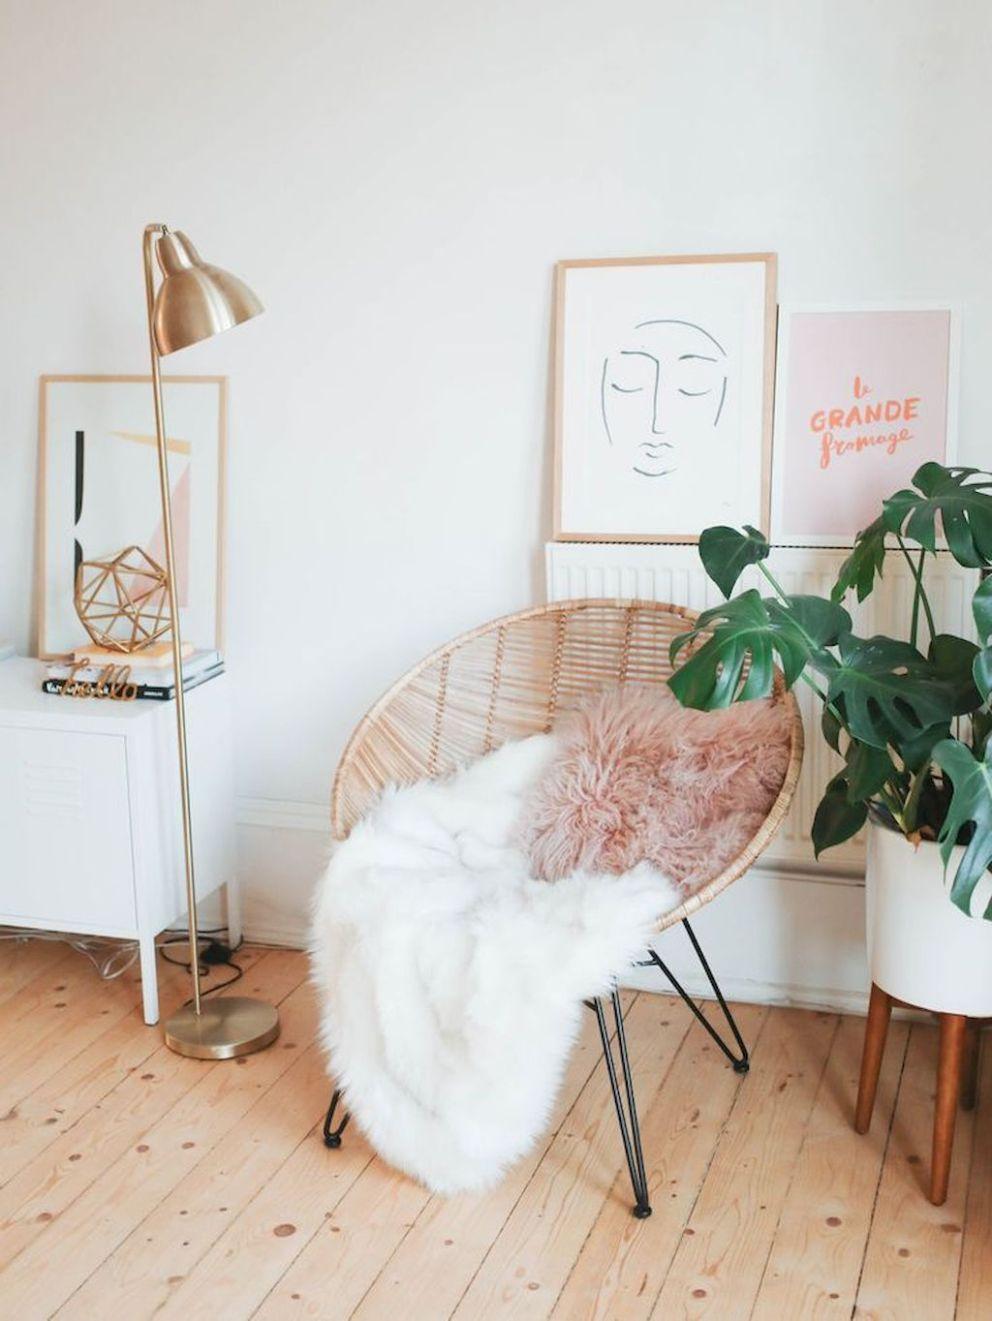 90 Cozy Apartment Living Room Decor Ideas 5b55e60709bc8 images